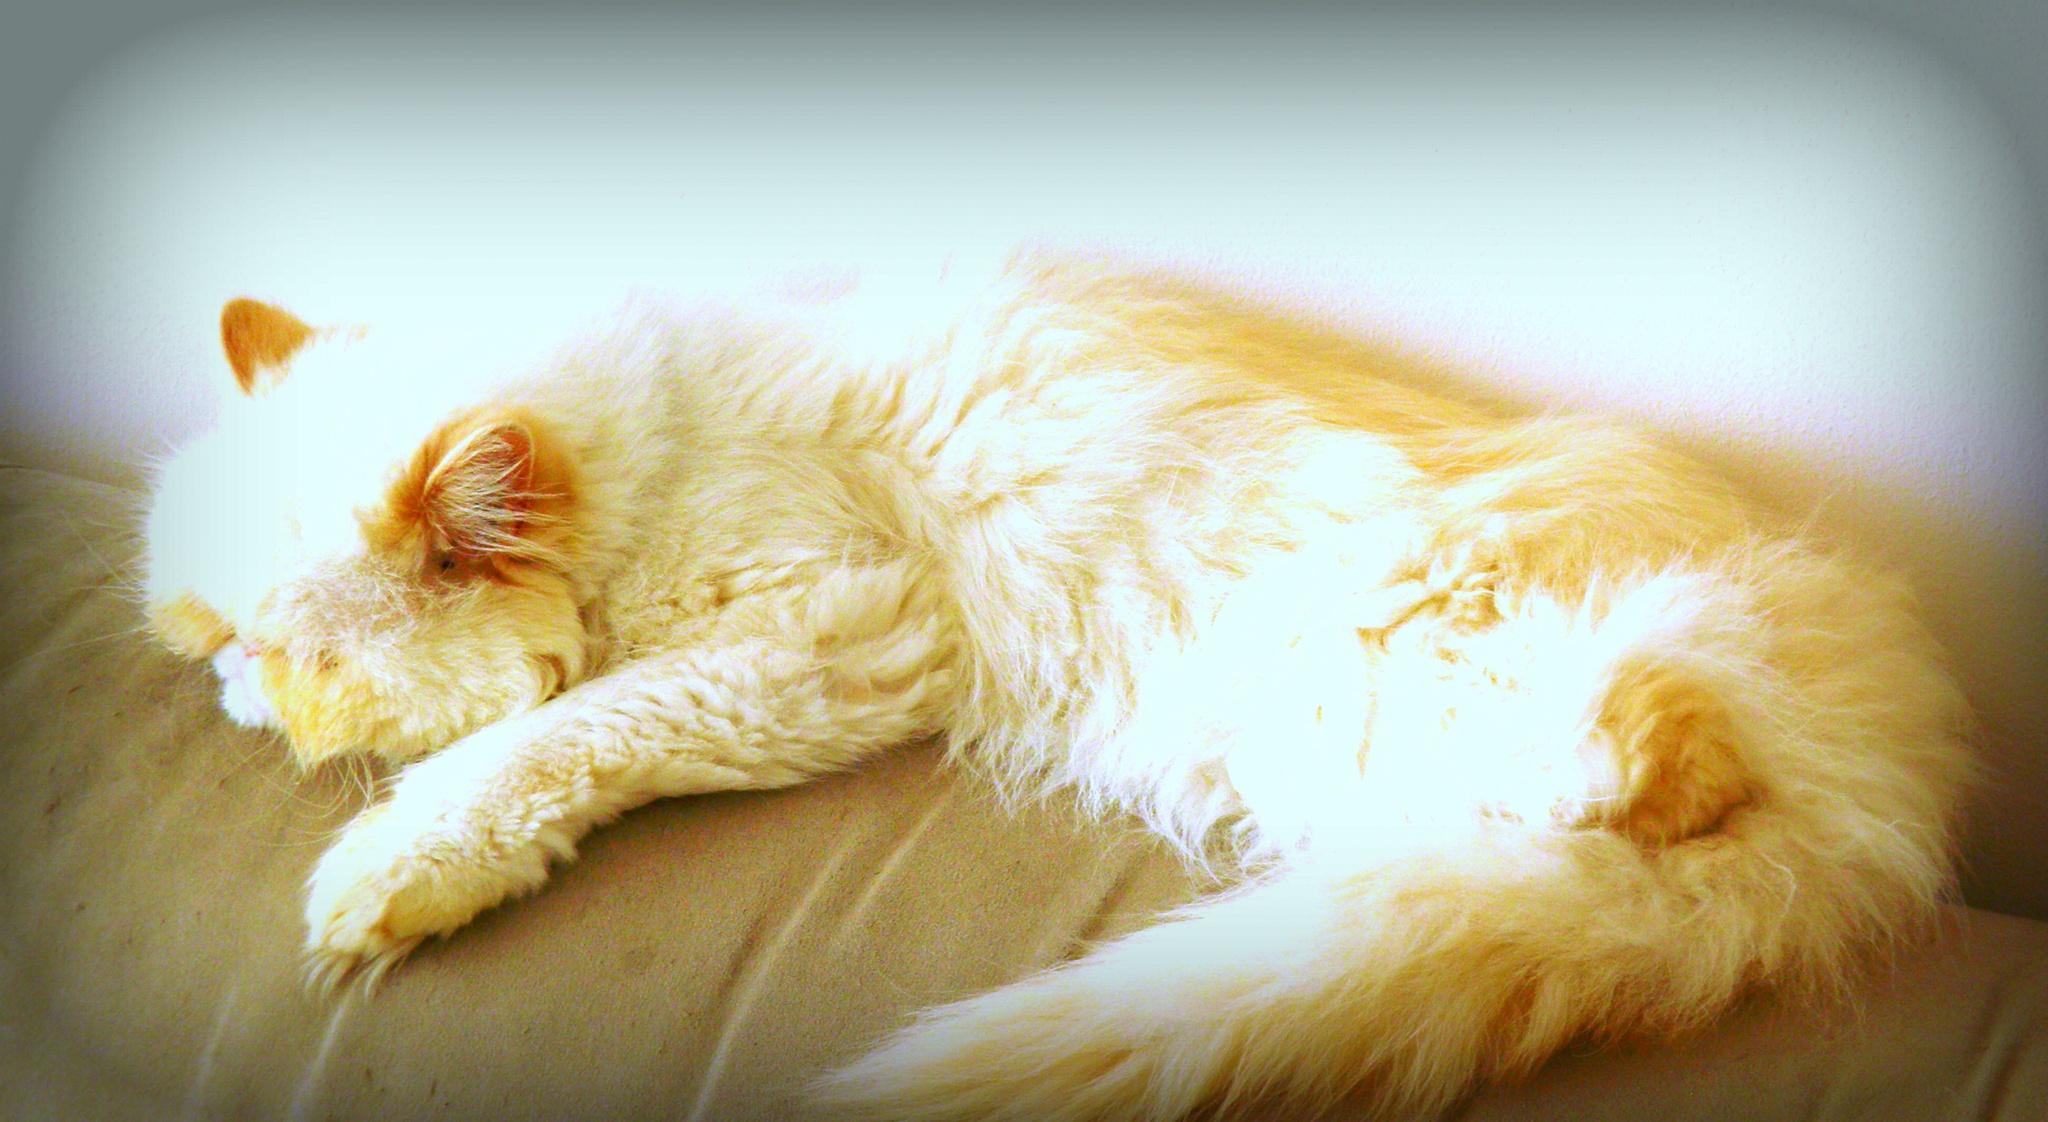 Asleep on the sofa xxx by karenanne.borsani